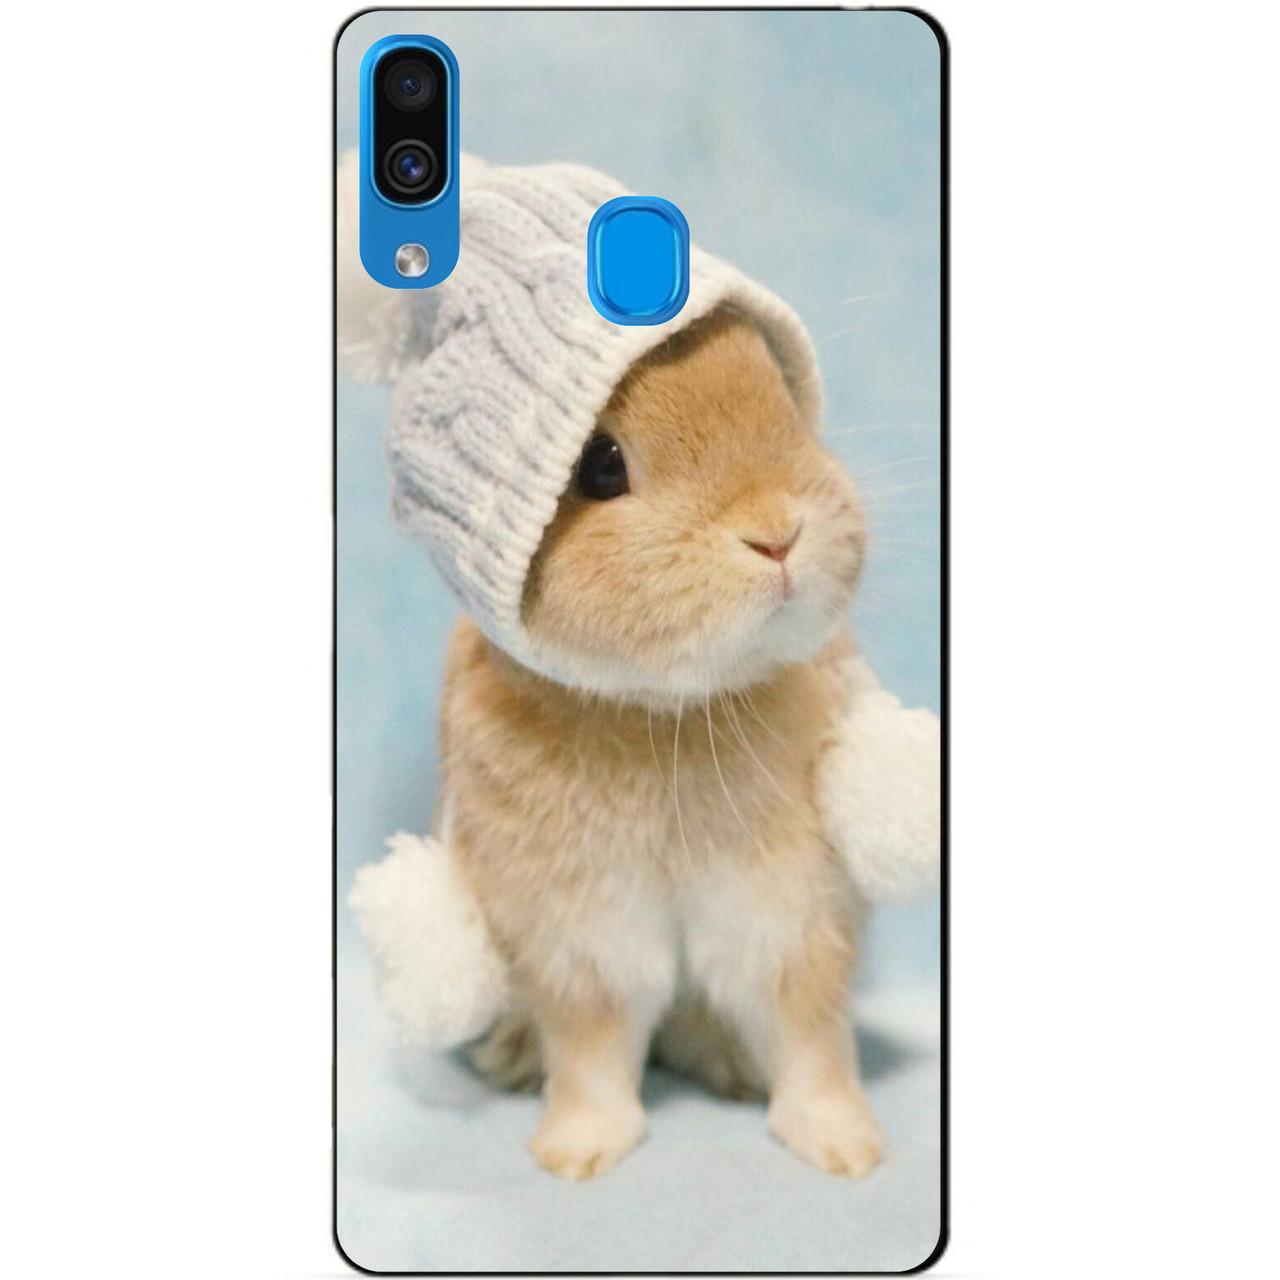 Силіконовий бампер чохол для Samsung A30 2019 Galaxy A305f з малюнком Зайчик в шапочці